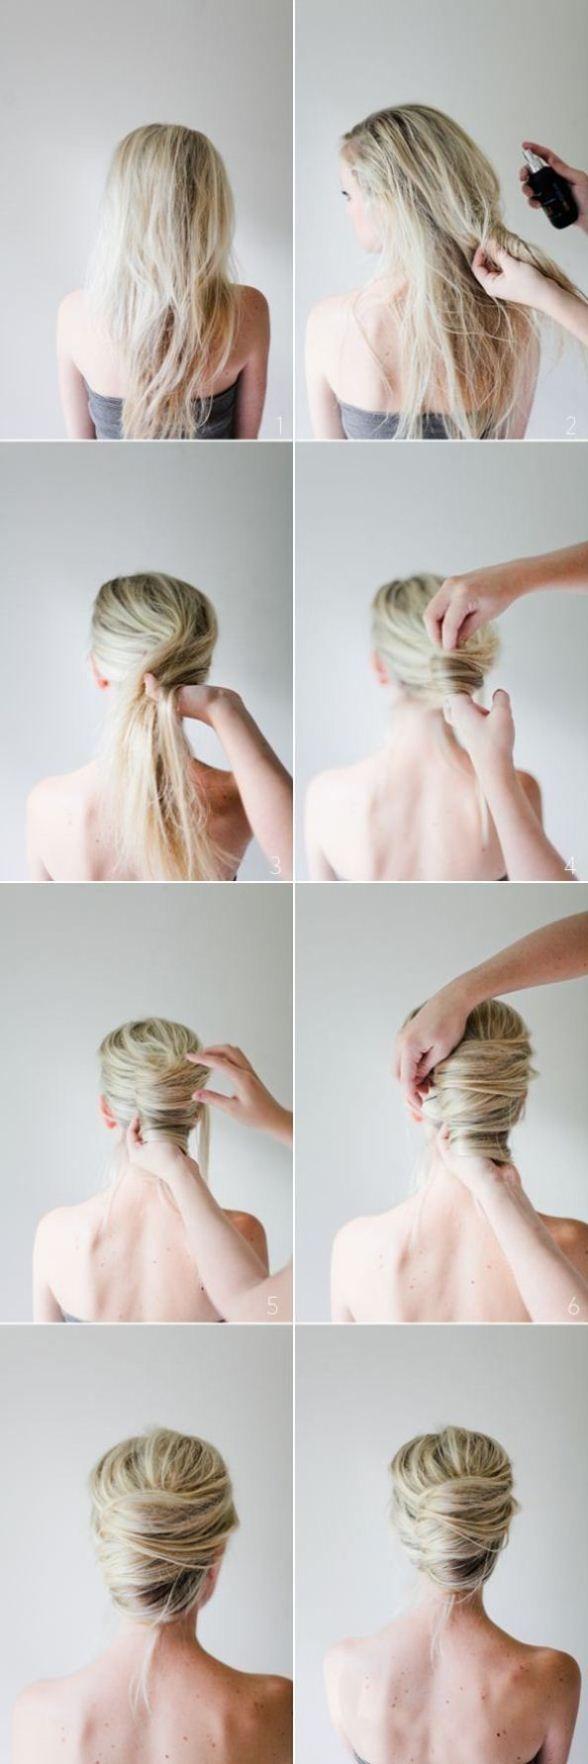 DIY Hair Bun diy diy ideas easy diy diy beauty diy hair diy fashion beauty diy diy bun diy style diy hair style diy updo